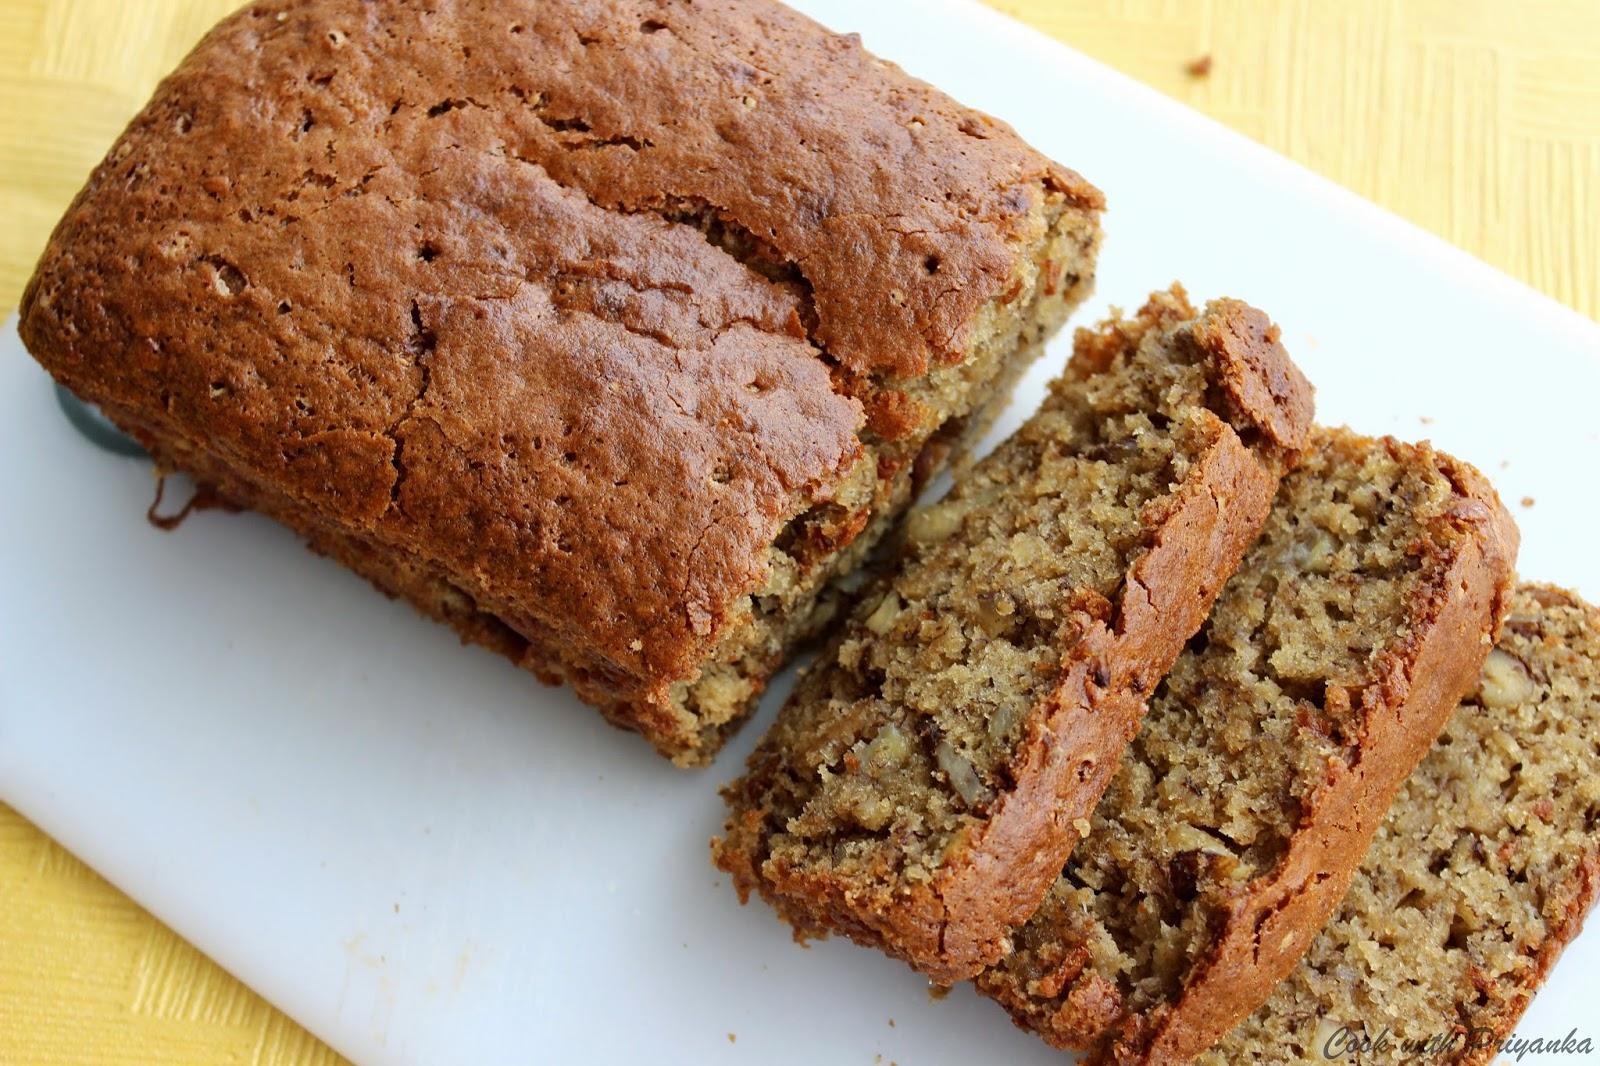 http://cookwithpriyankavarma.blogspot.co.uk/2014/05/banana-walnut-cake-eggless_20.html